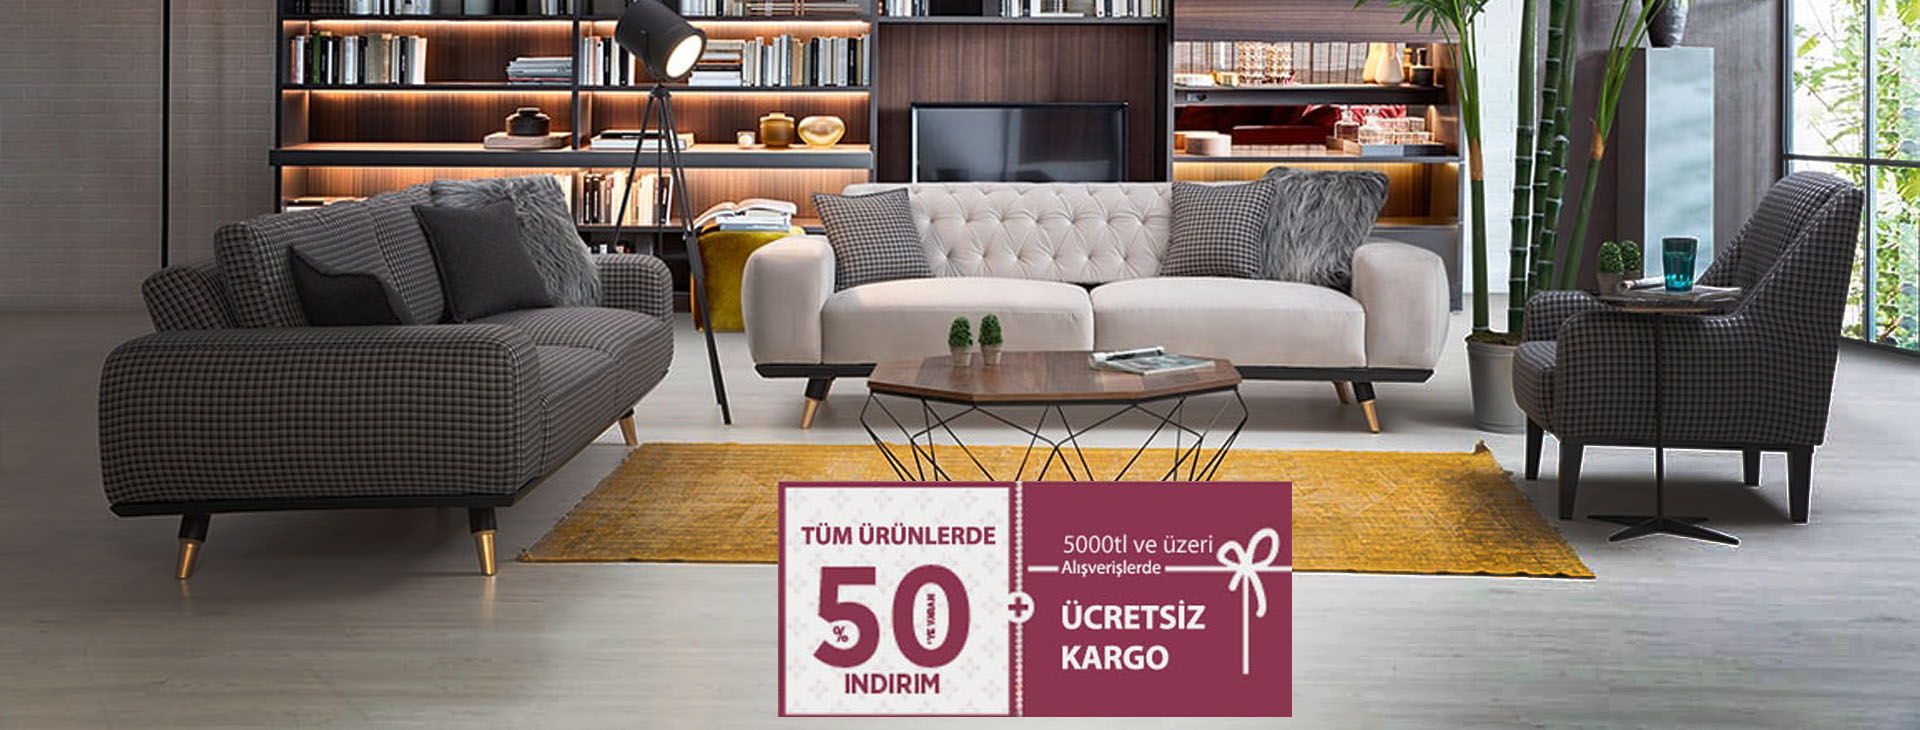 Viev Mobilya Ankara Mobilya Siteler Model Fiyatlari